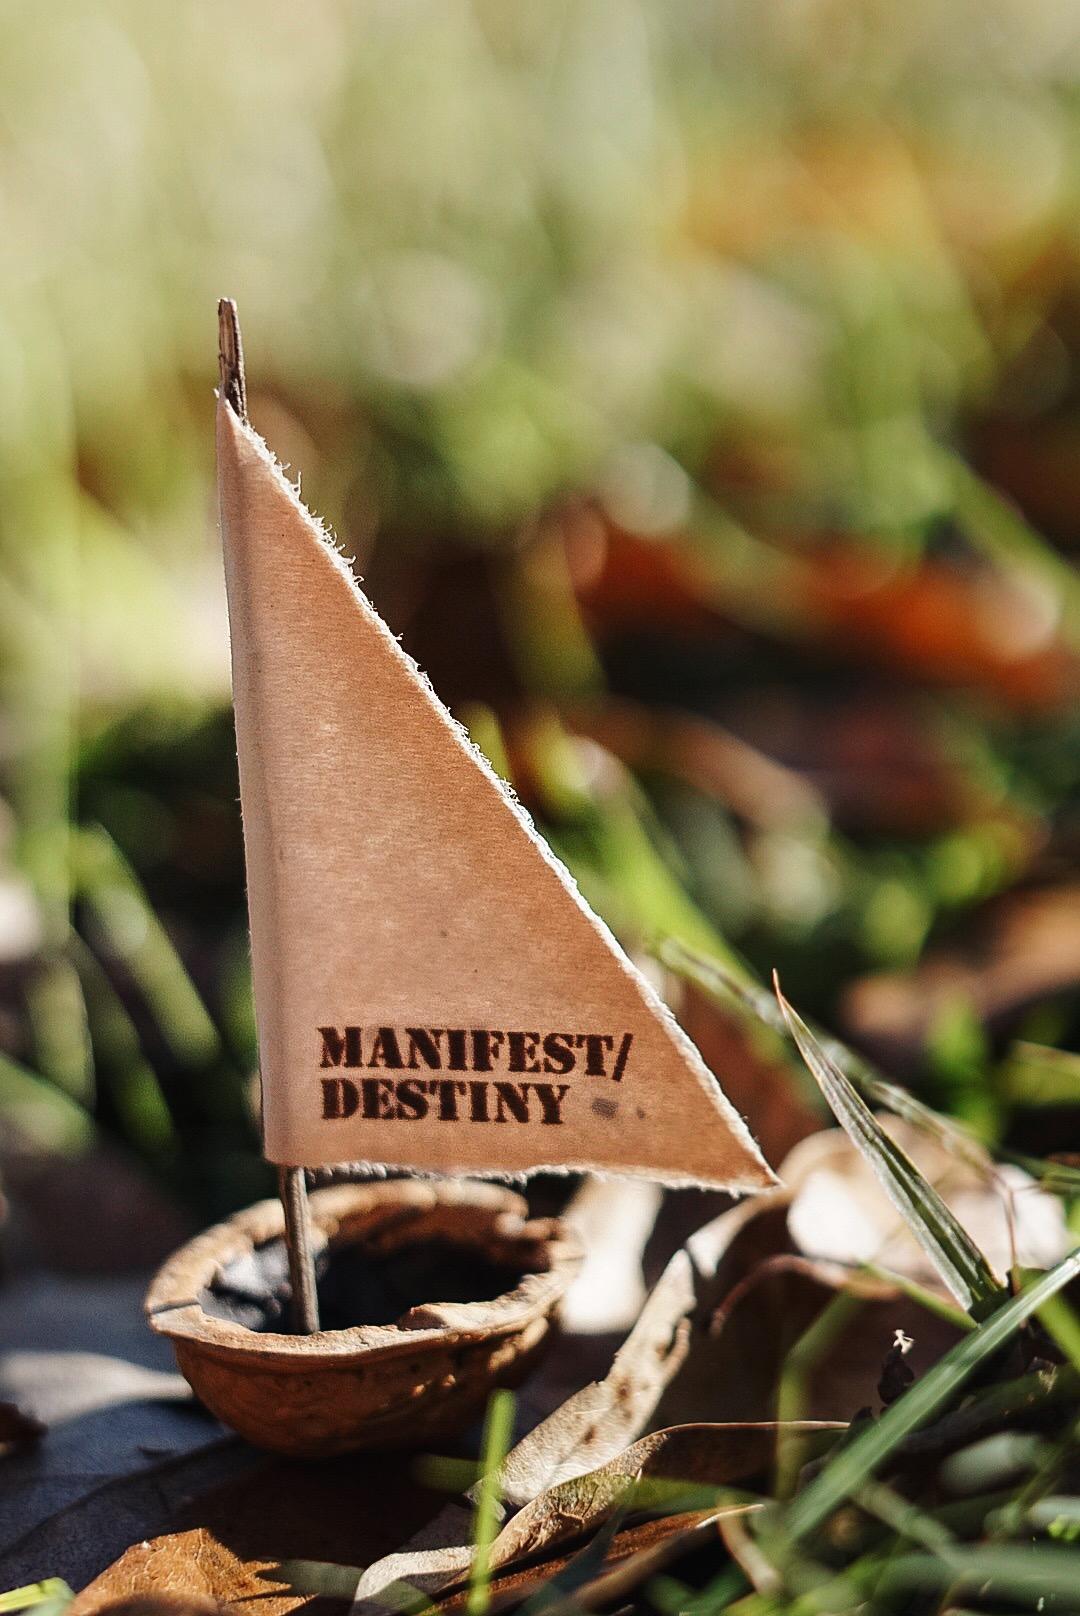 Manifest_Destiny_St_Louis_Walnut_Shell